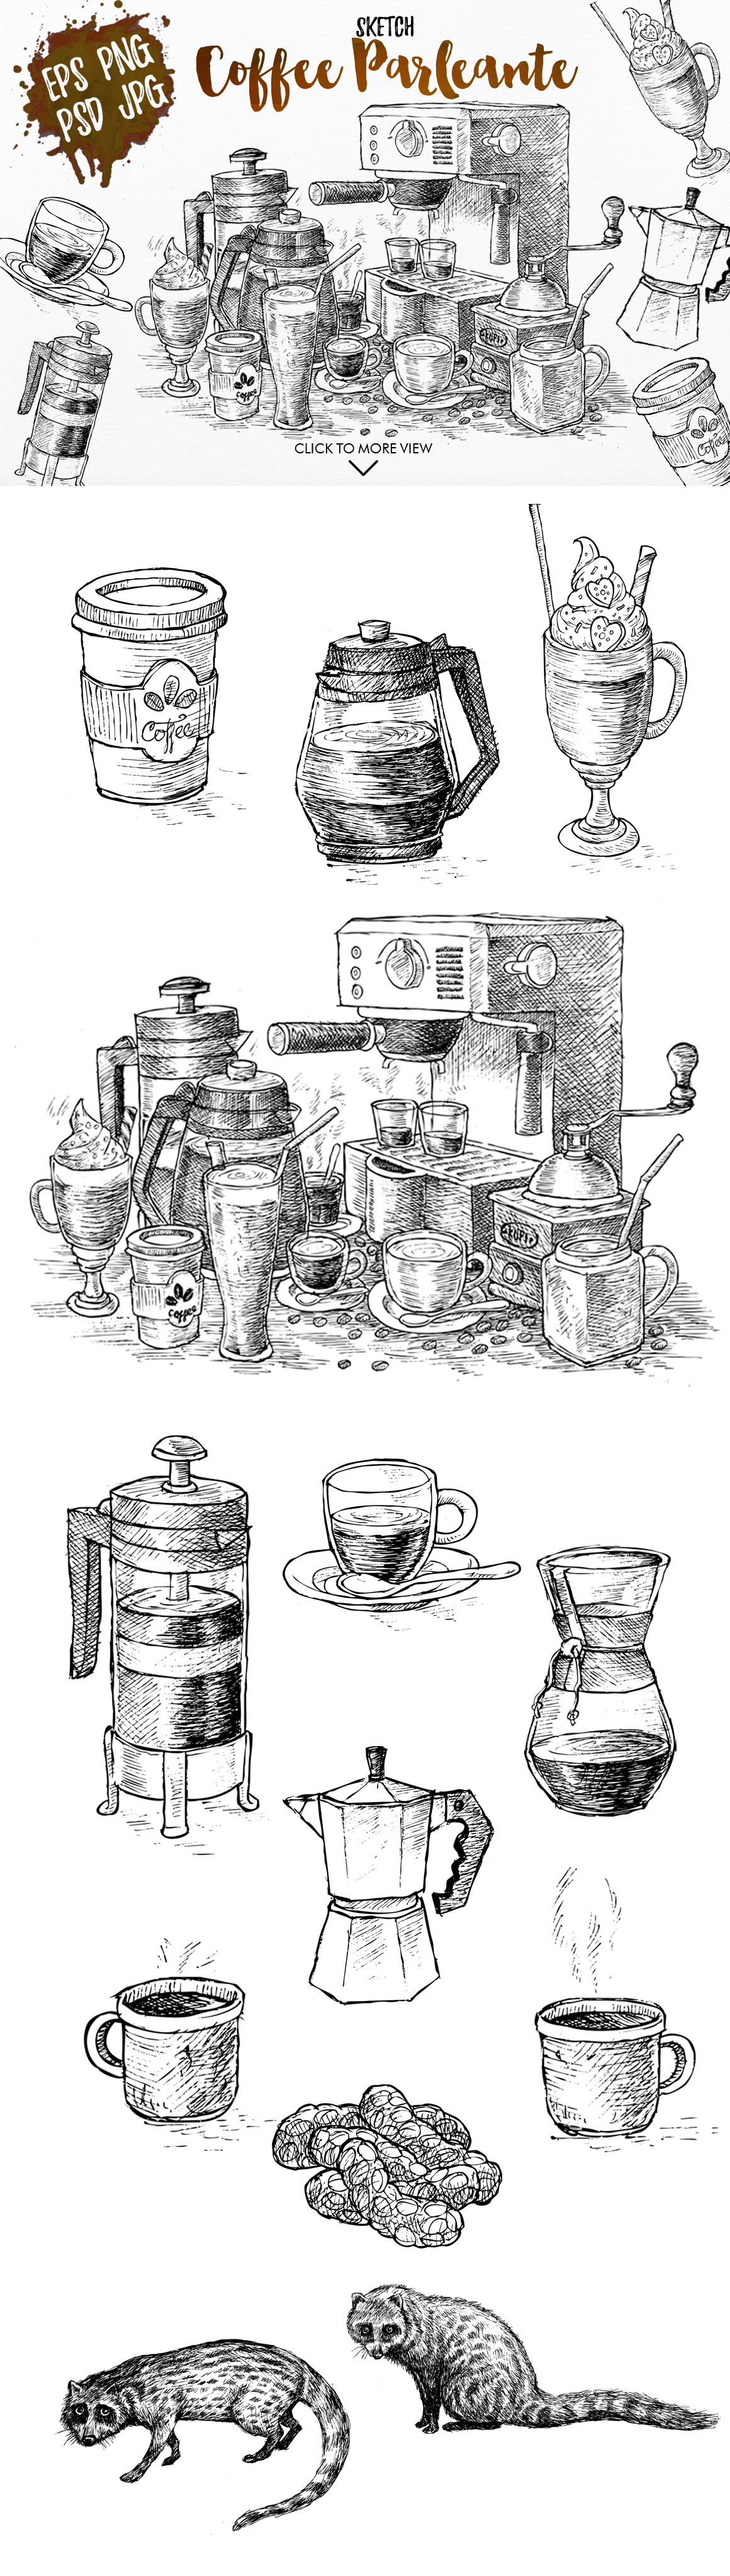 Watercolor Coffee Black Parleante example image 2